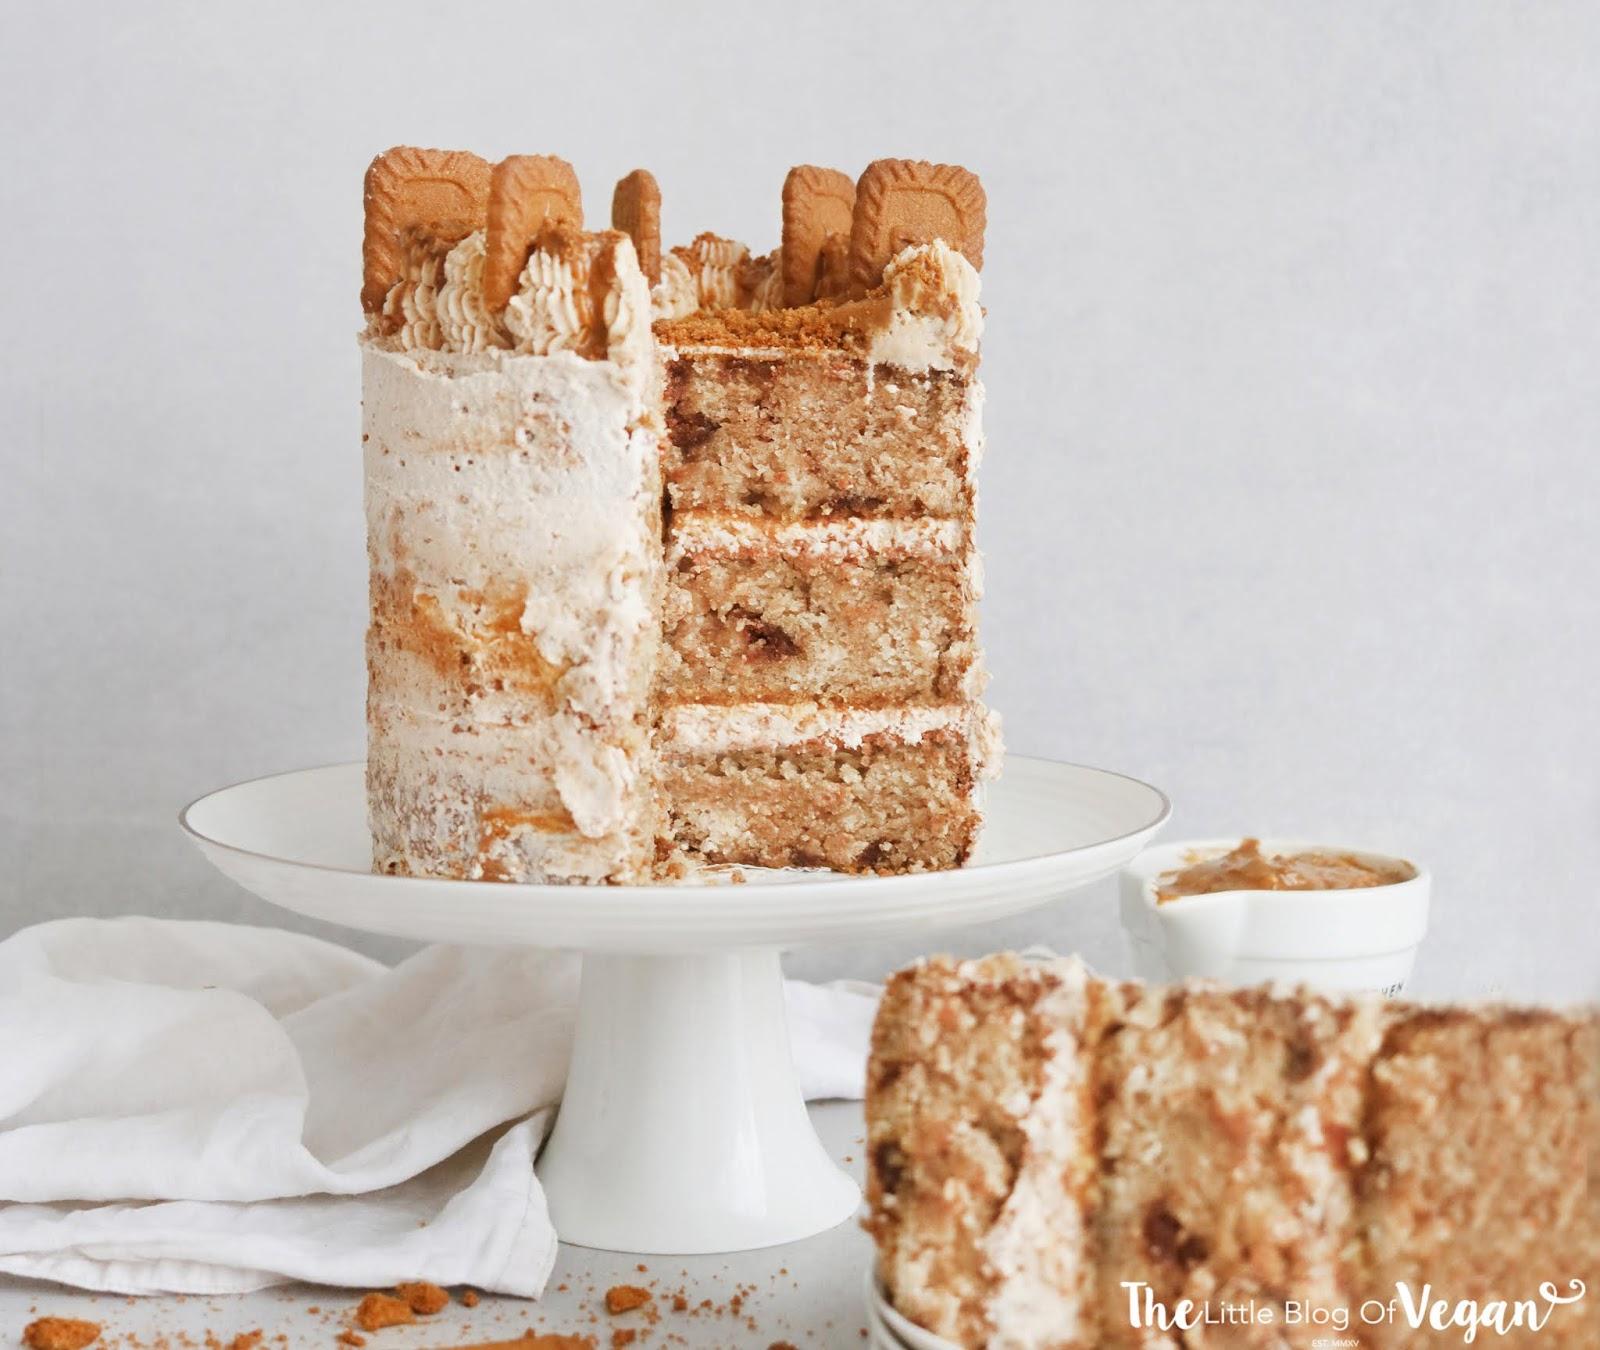 Ultimate Biscoff cake recipe